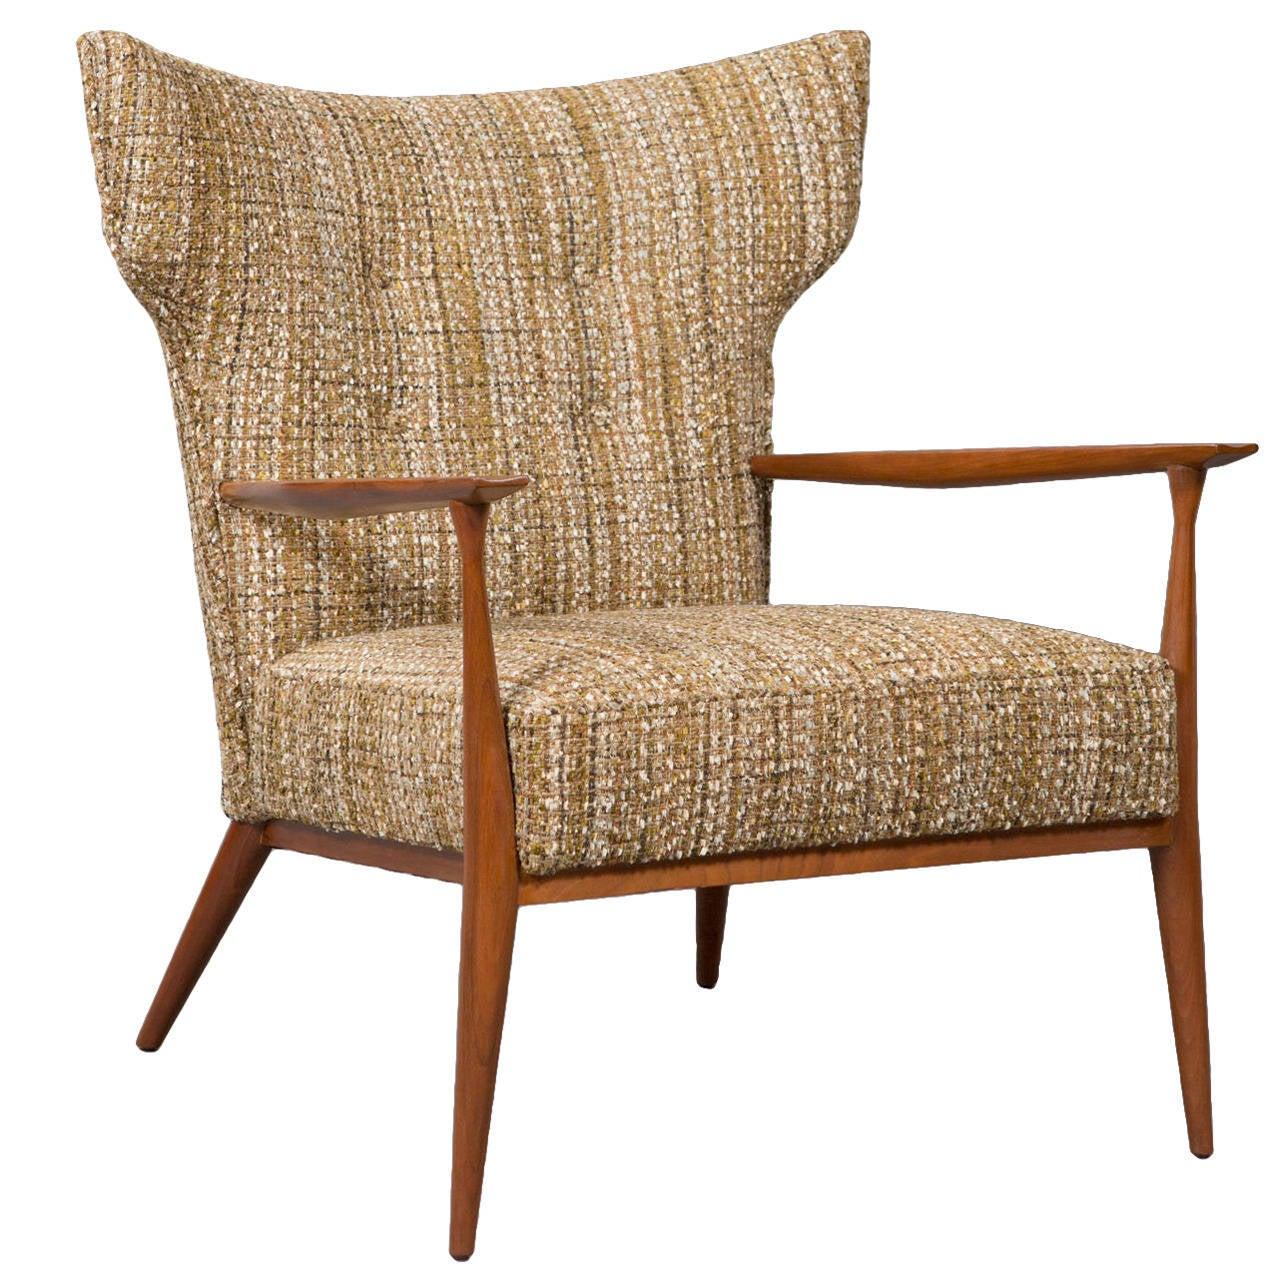 Rare 1950s Paul McCobb Wingback Lounge Chair at 1stdibs